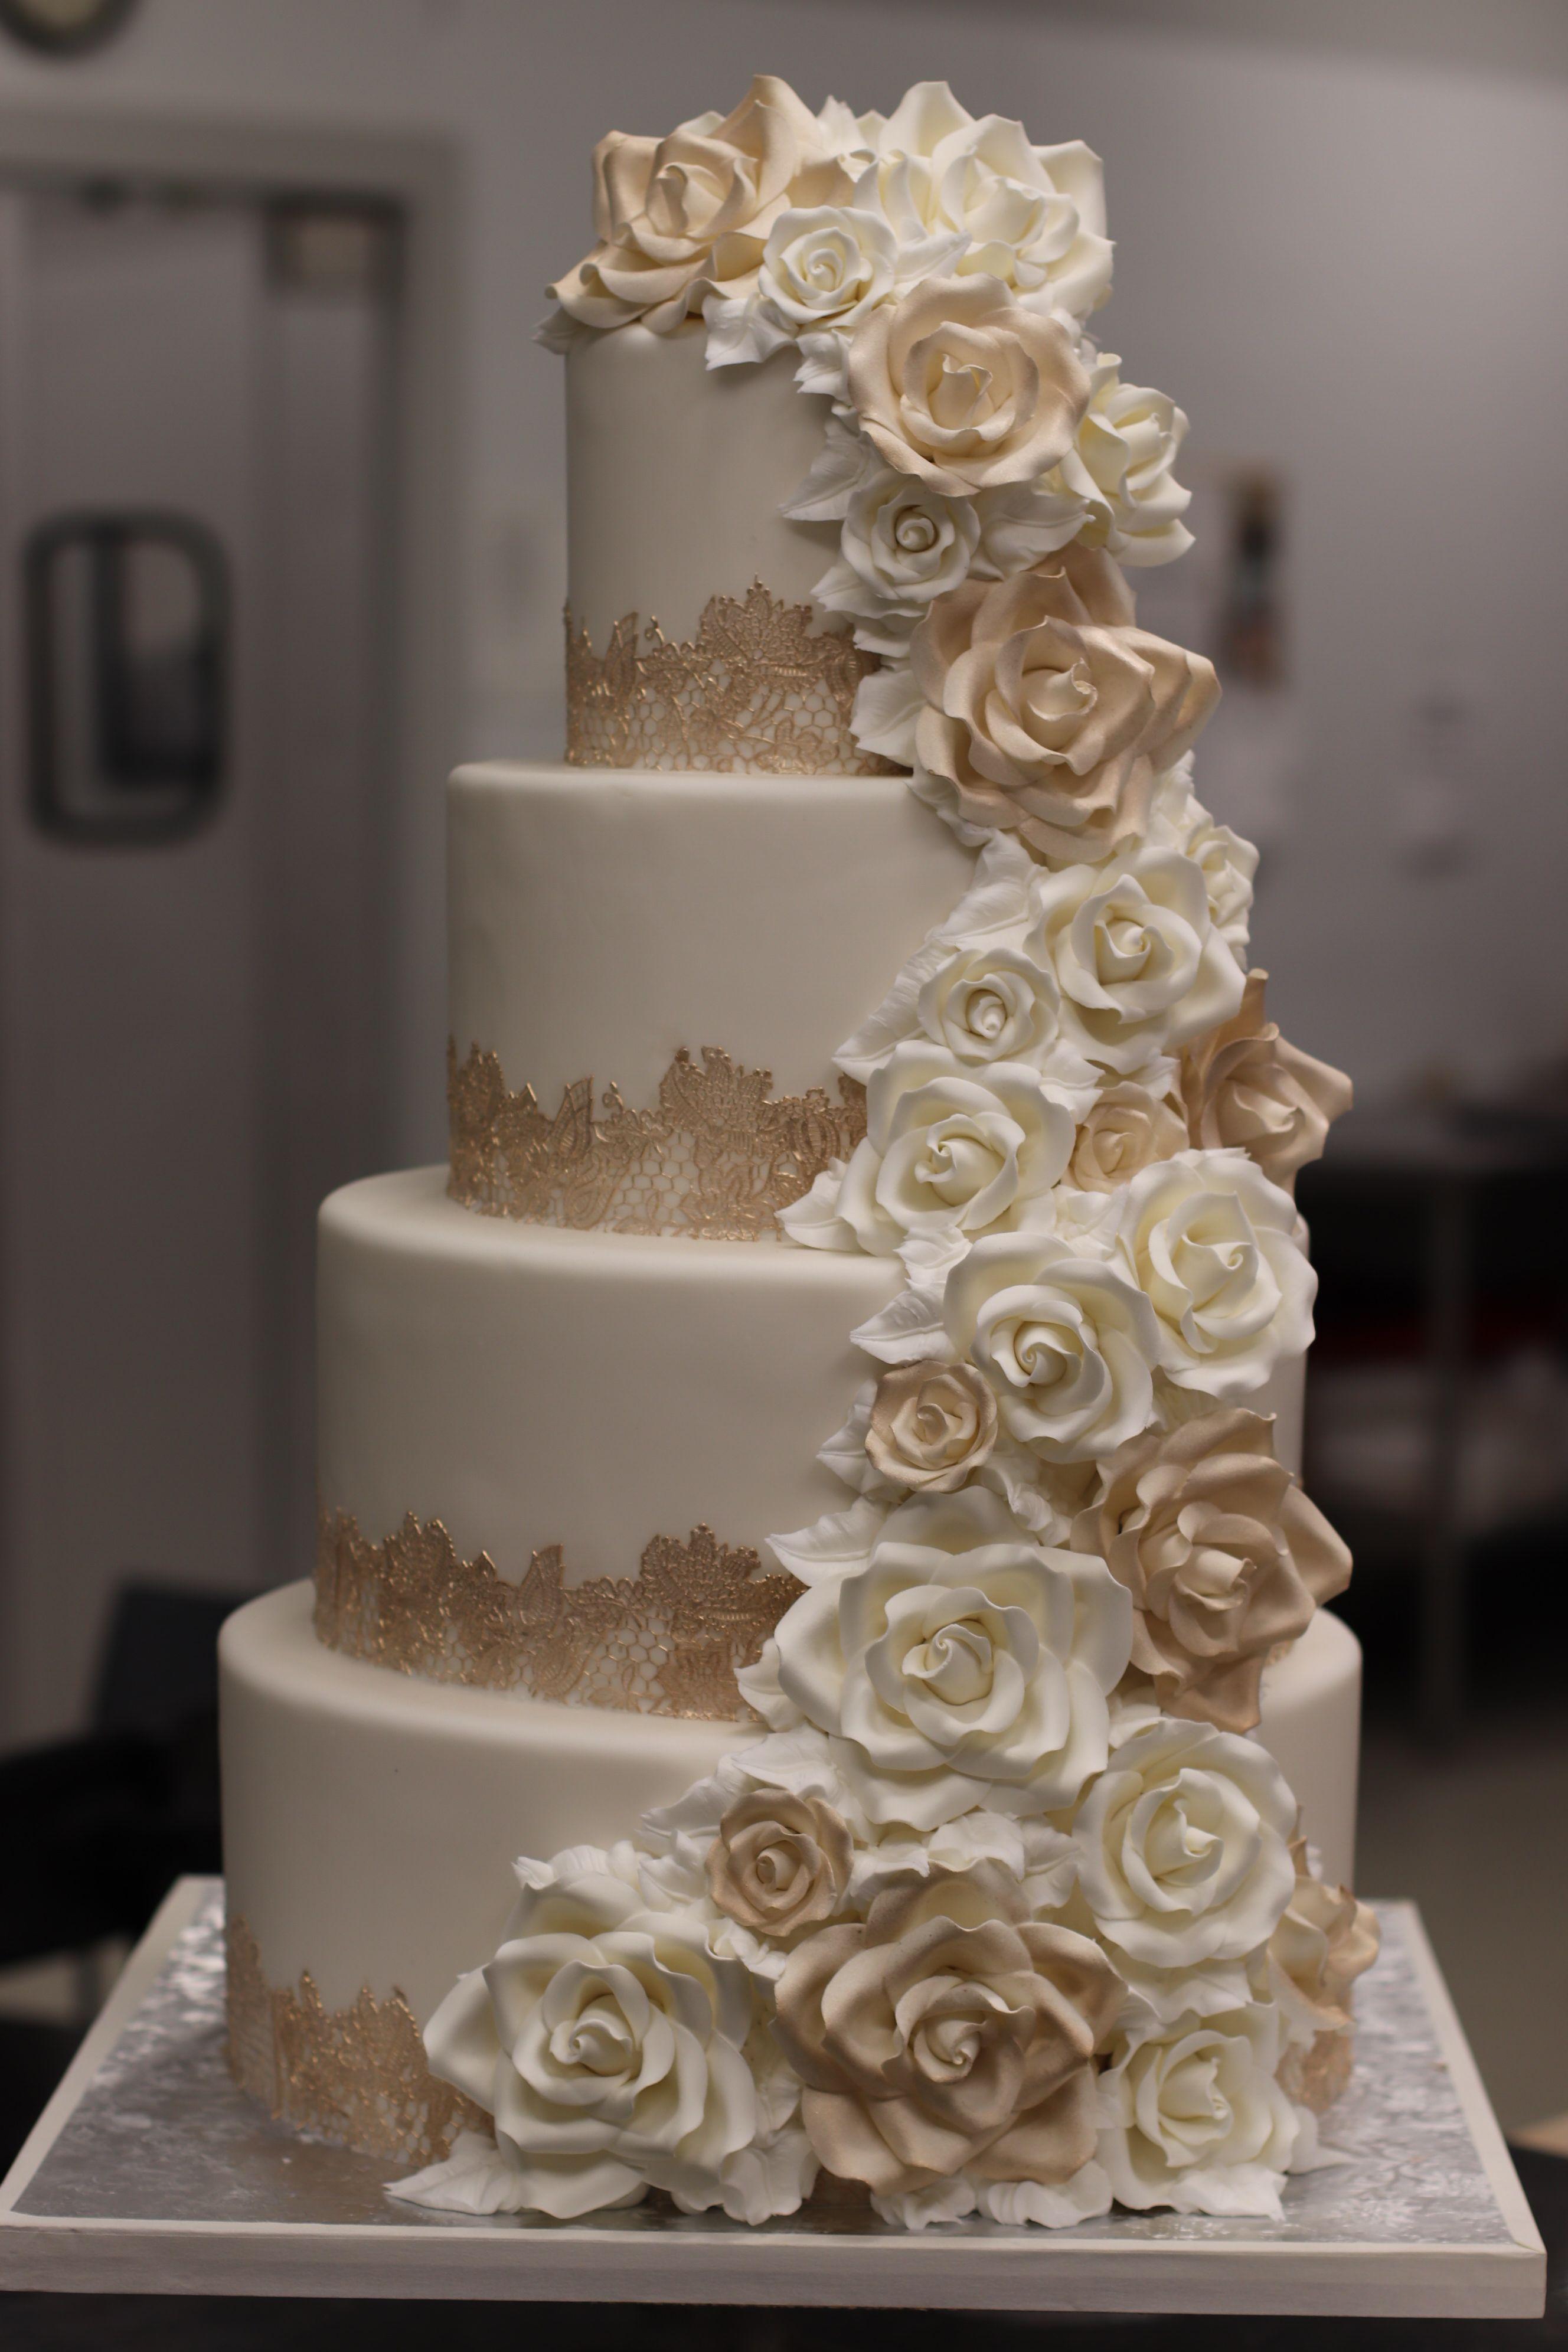 A Little Cake - Custom Birthday Cakes & Wedding Cakes NJ / NYC / CT